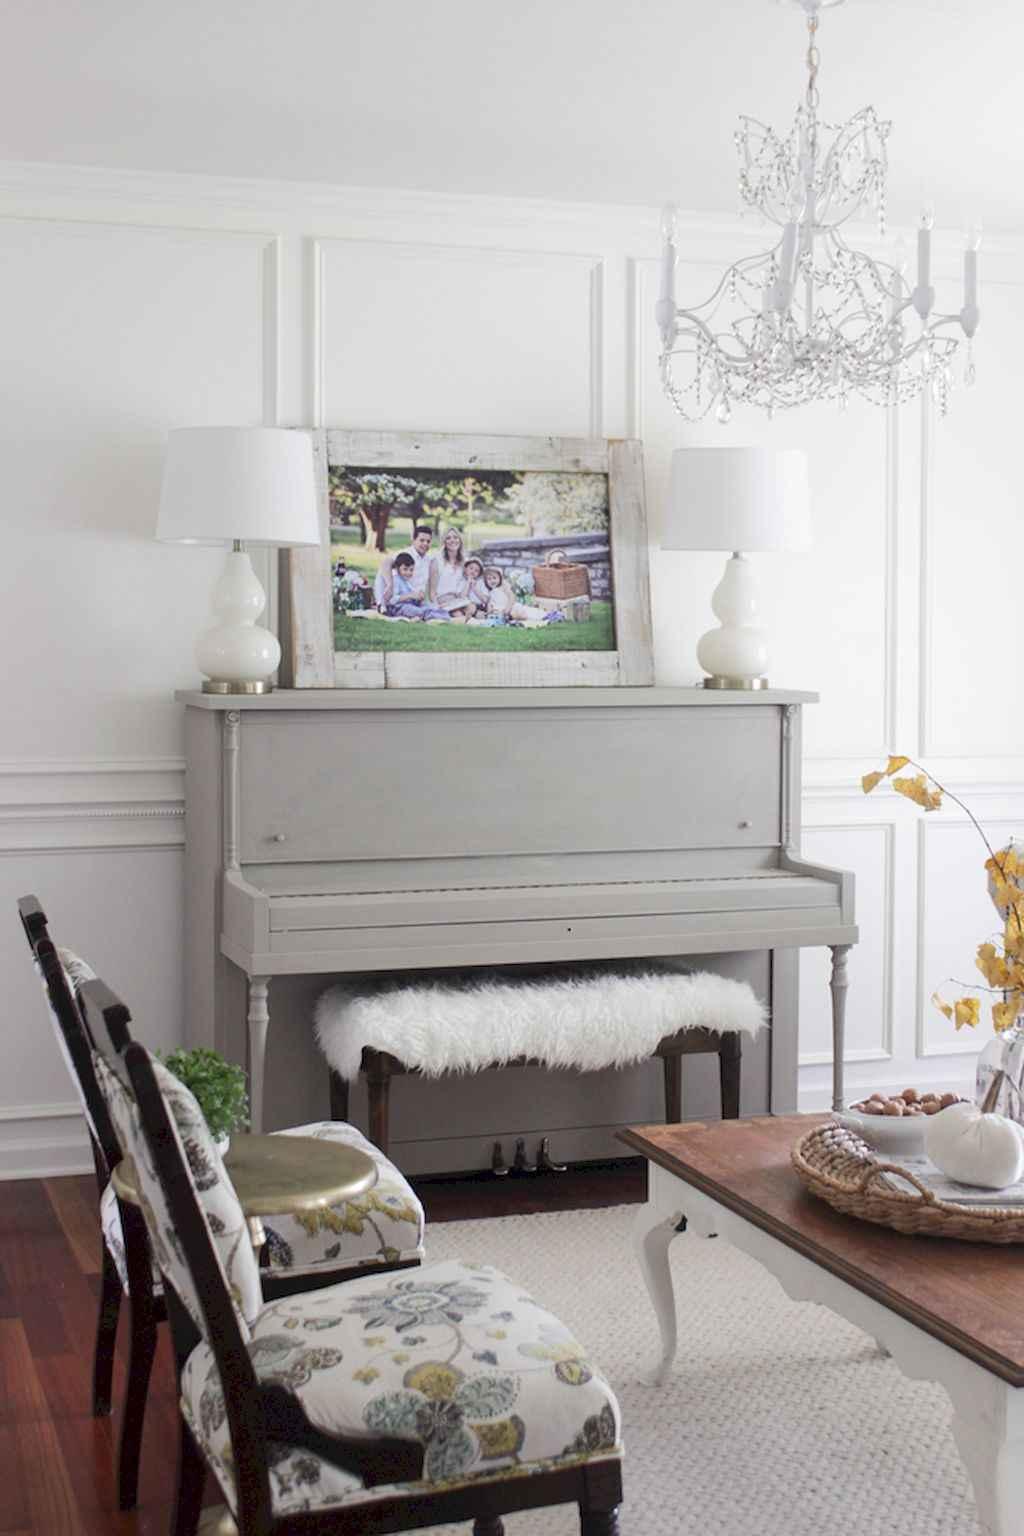 Simple clean vintage living room decorating ideas (26)